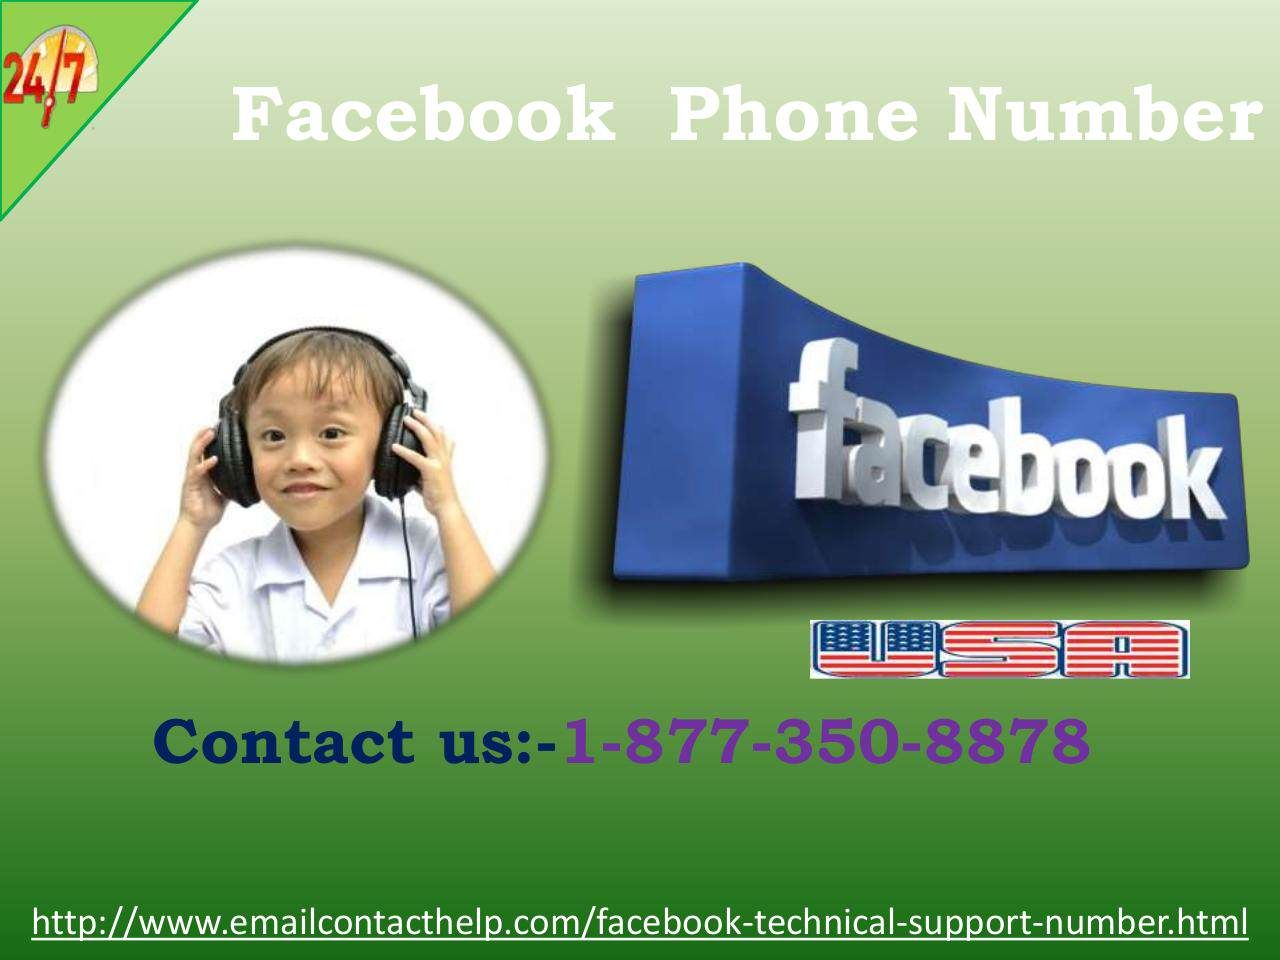 Vim and vigour to solve your FB problems Facebook Phone